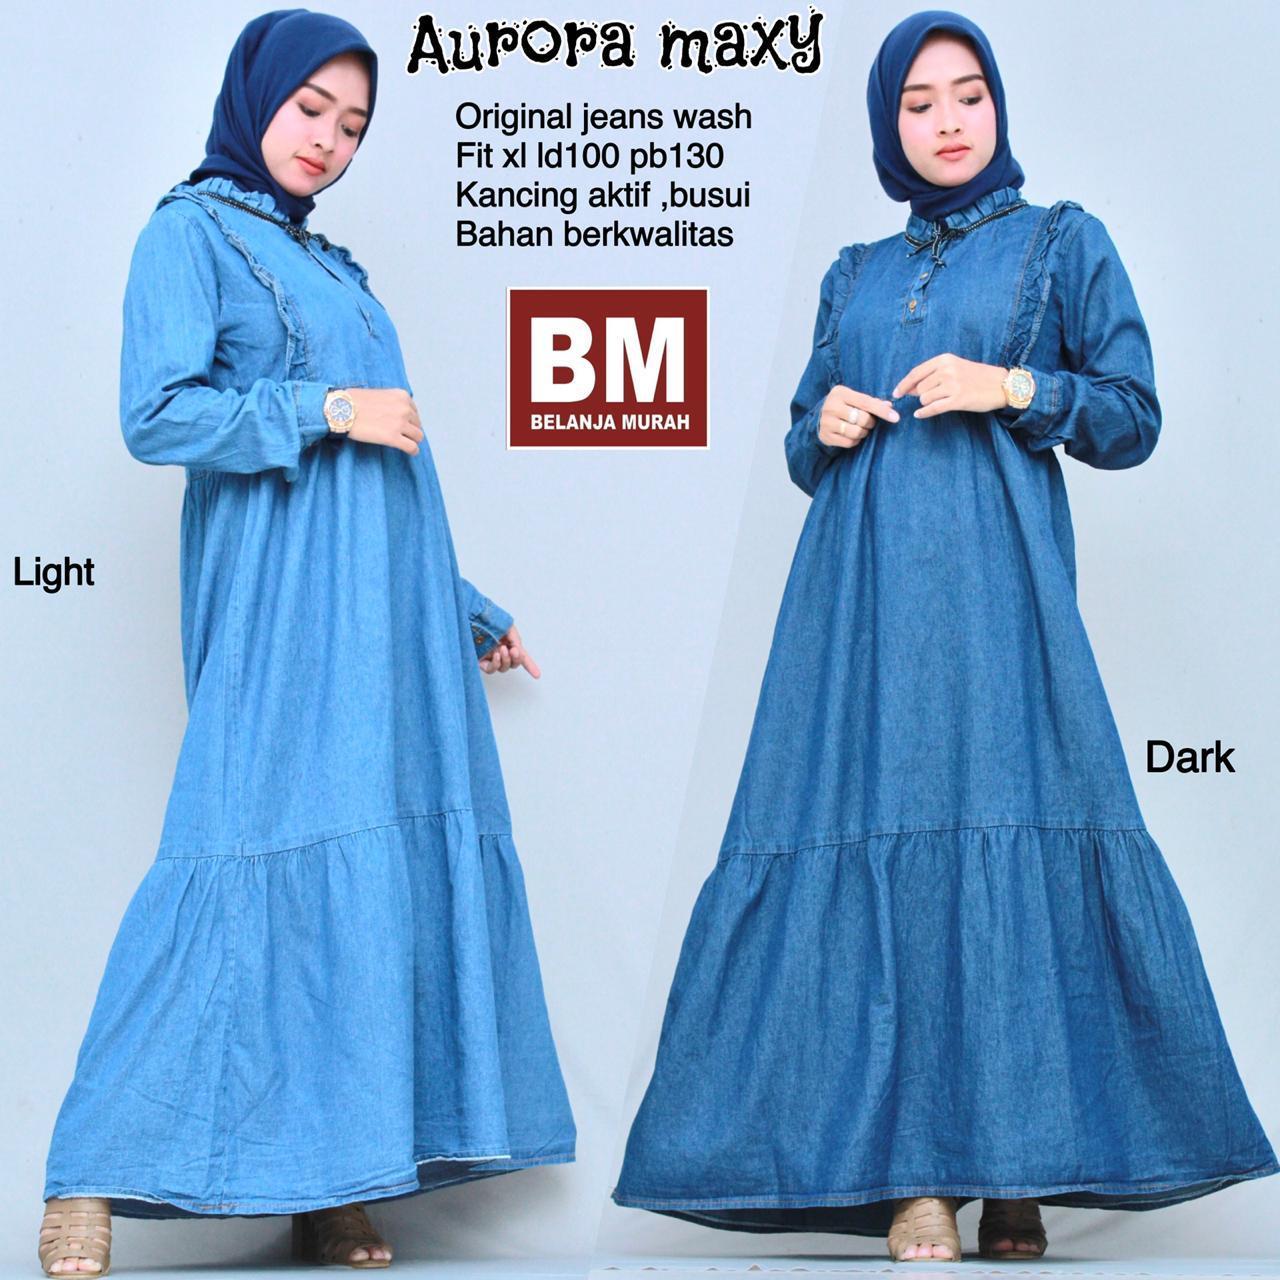 Aurora Maxy - pakaian wanita - dress - baju muslim - fashion wanita -dress bahan jeans